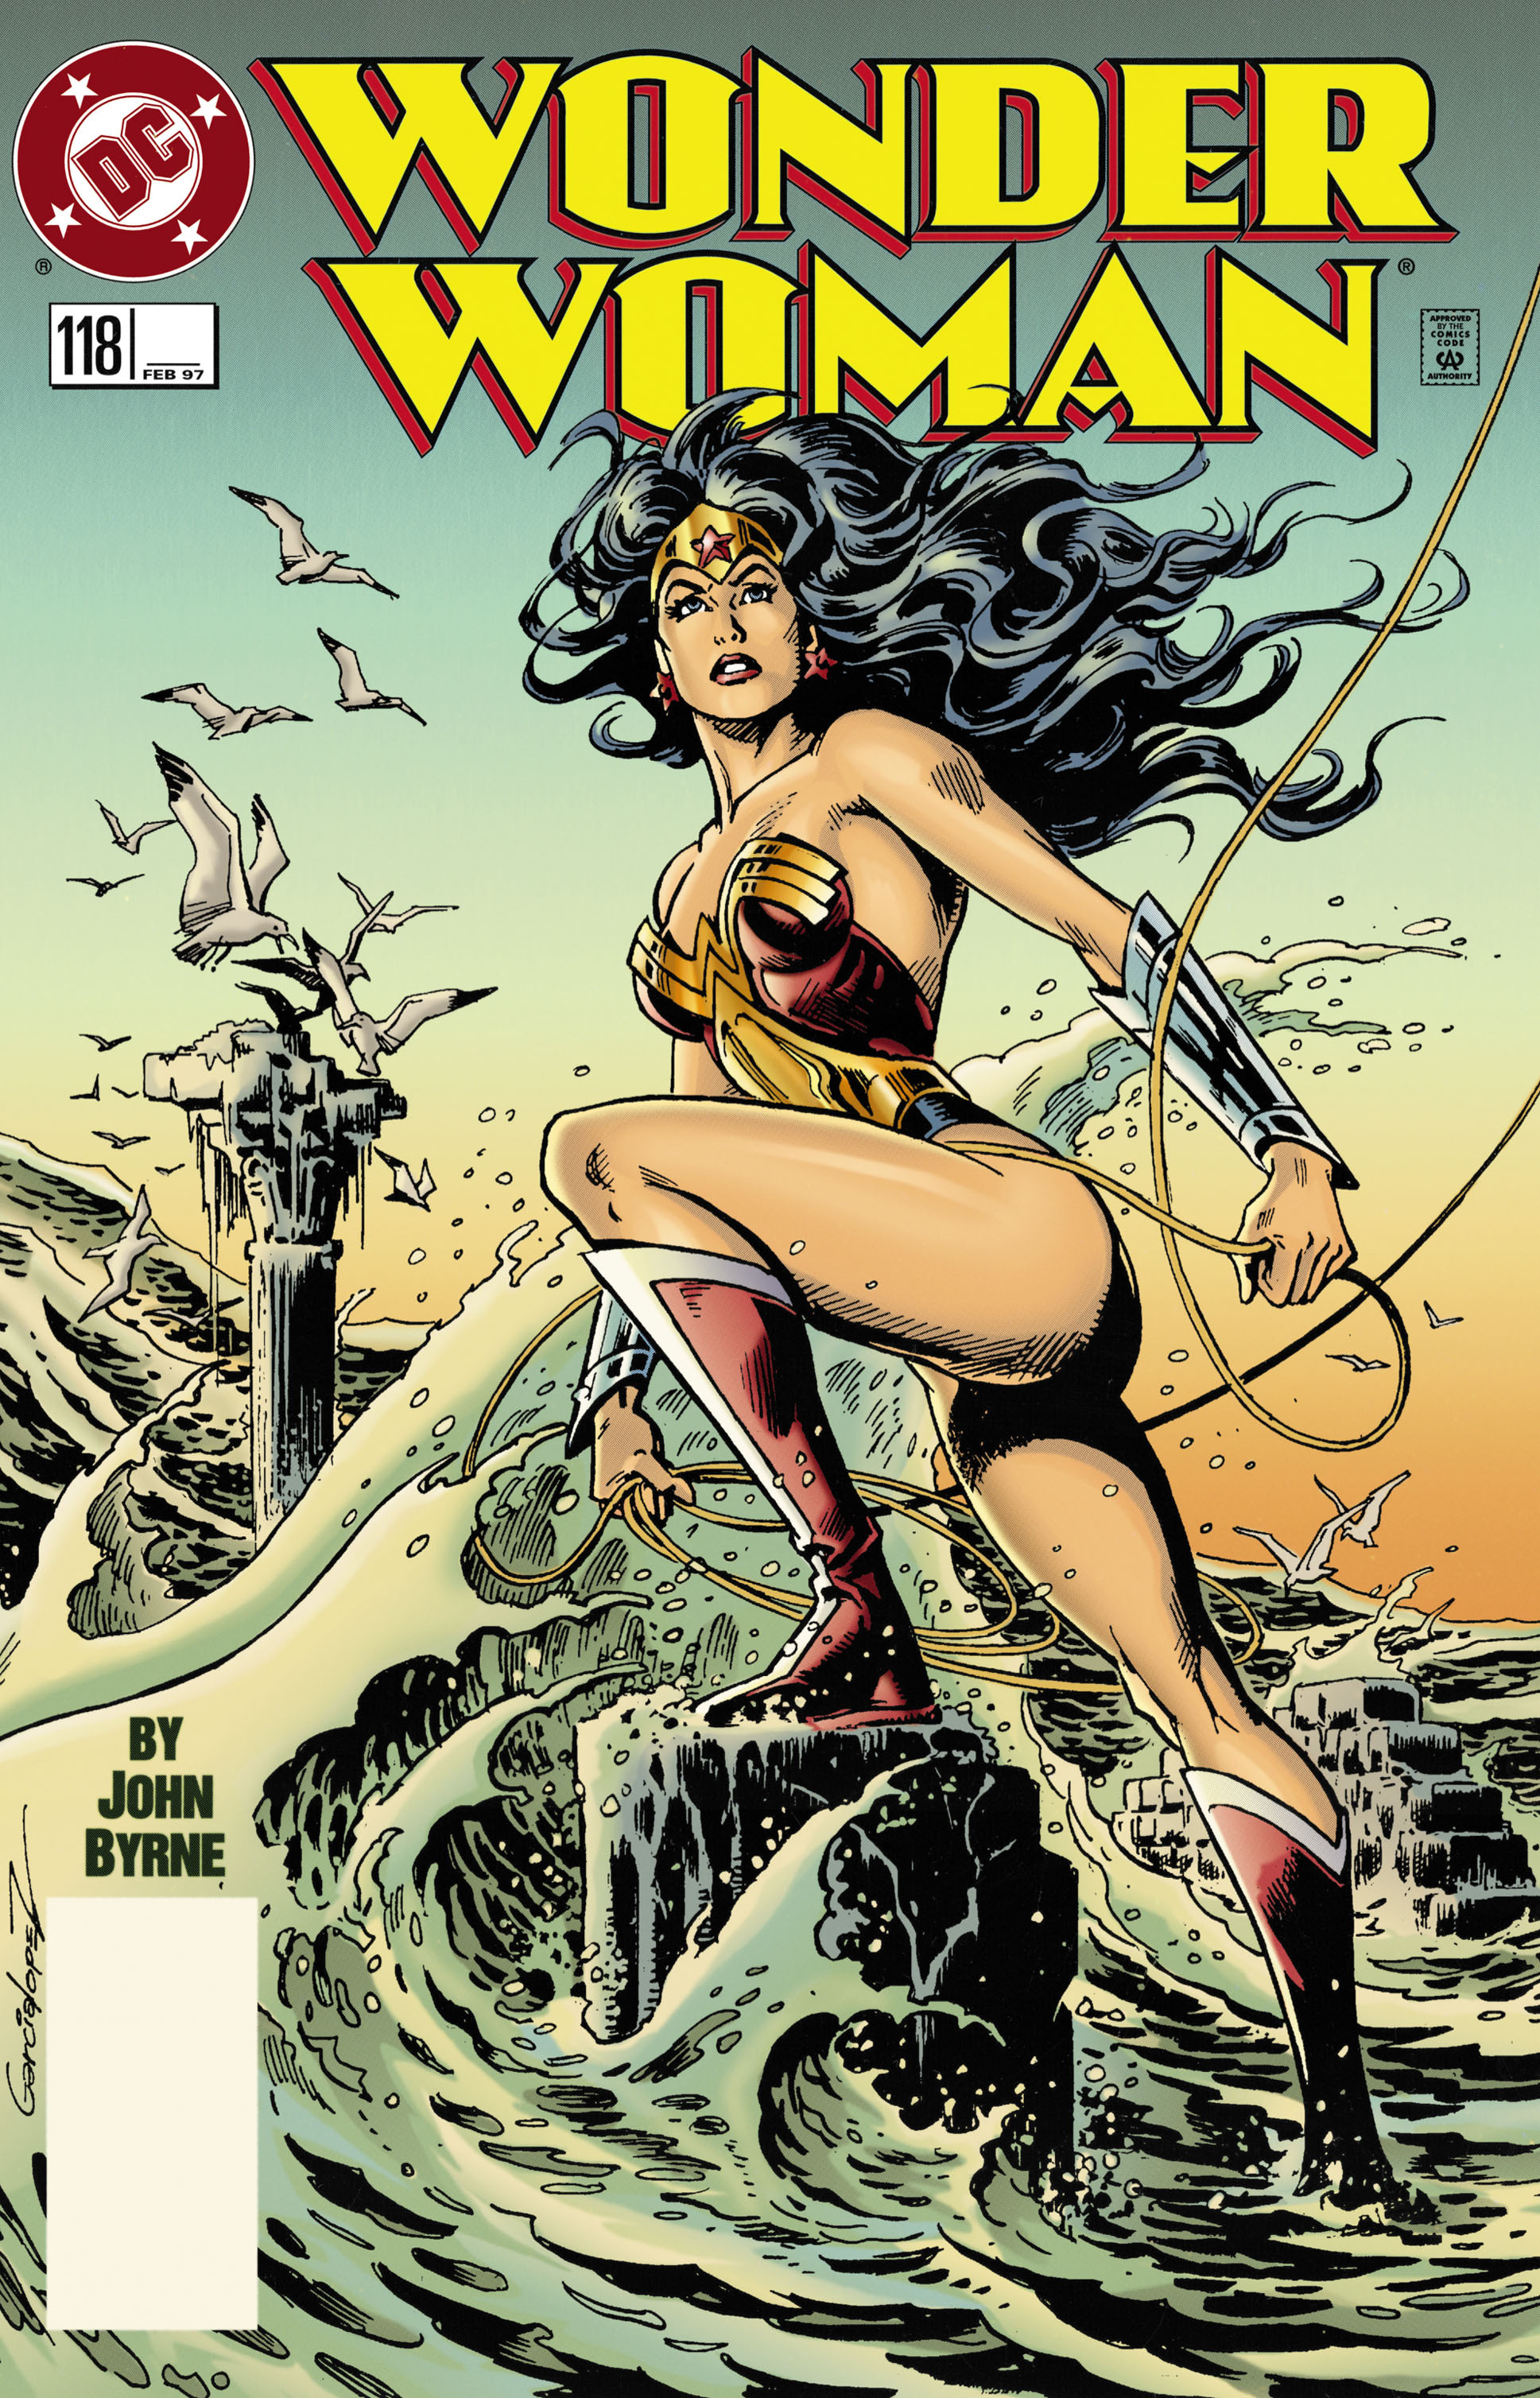 Read online Wonder Woman (1987) comic -  Issue #118 - 1